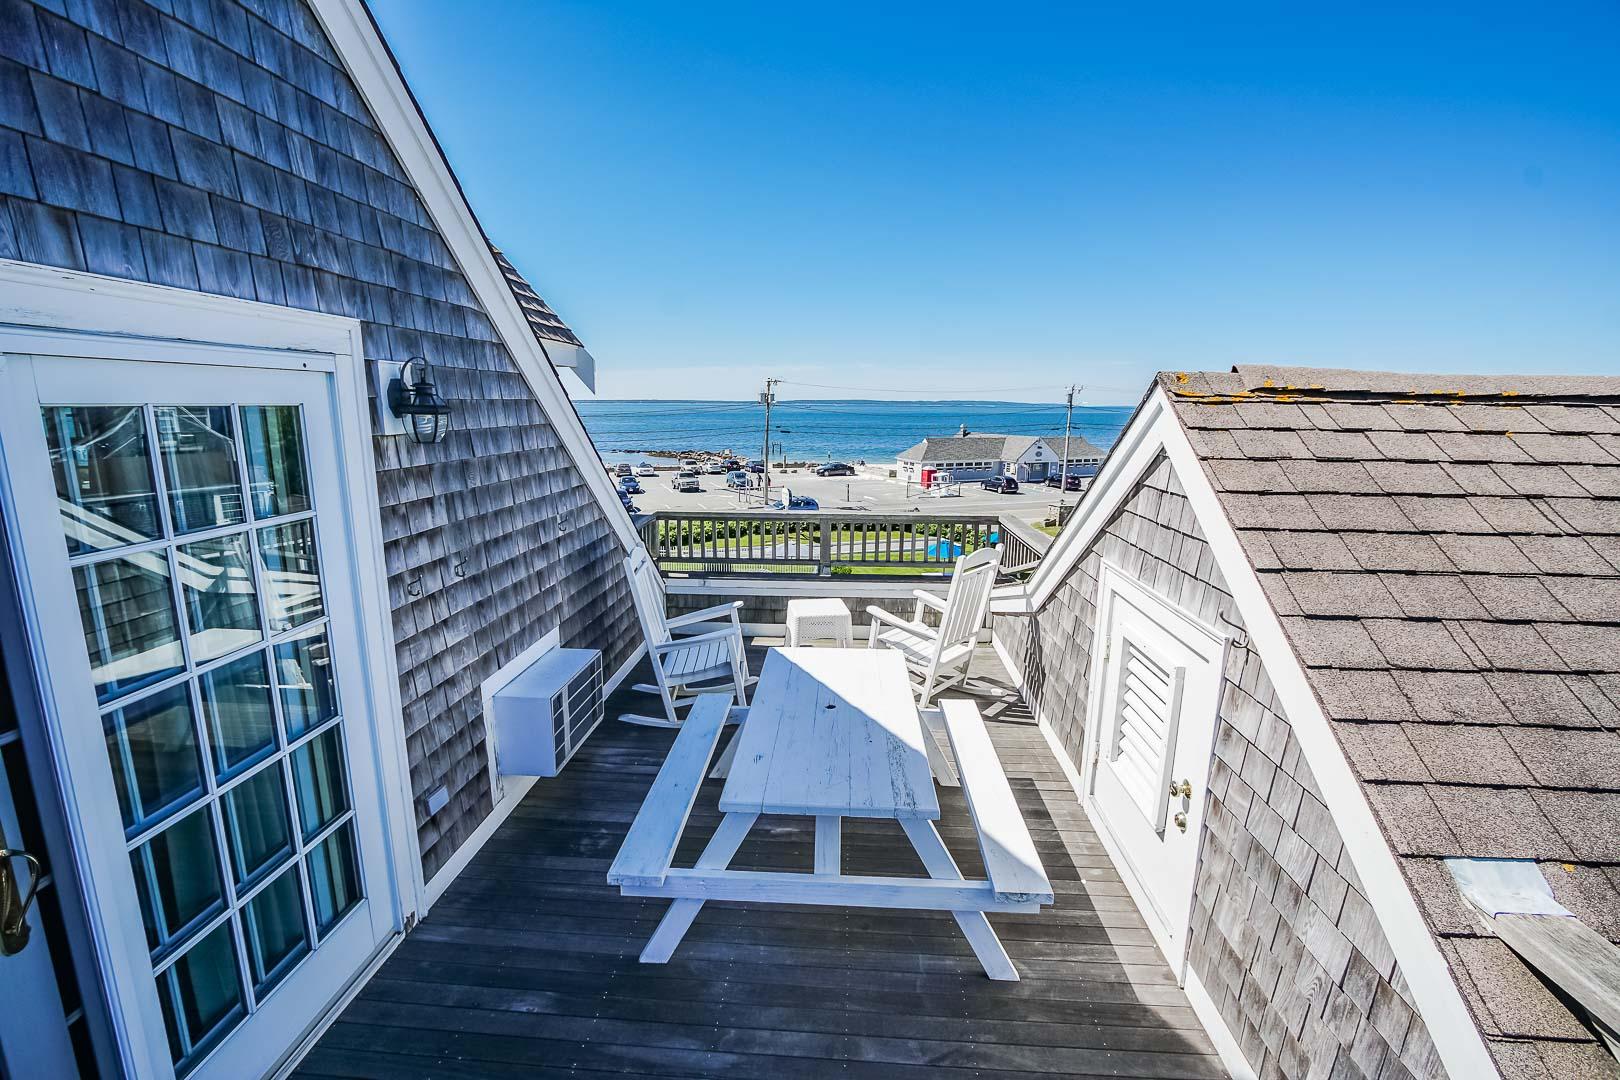 A serene beach view from the balcony at VRI's Beachside Village Resort in Massachusetts.